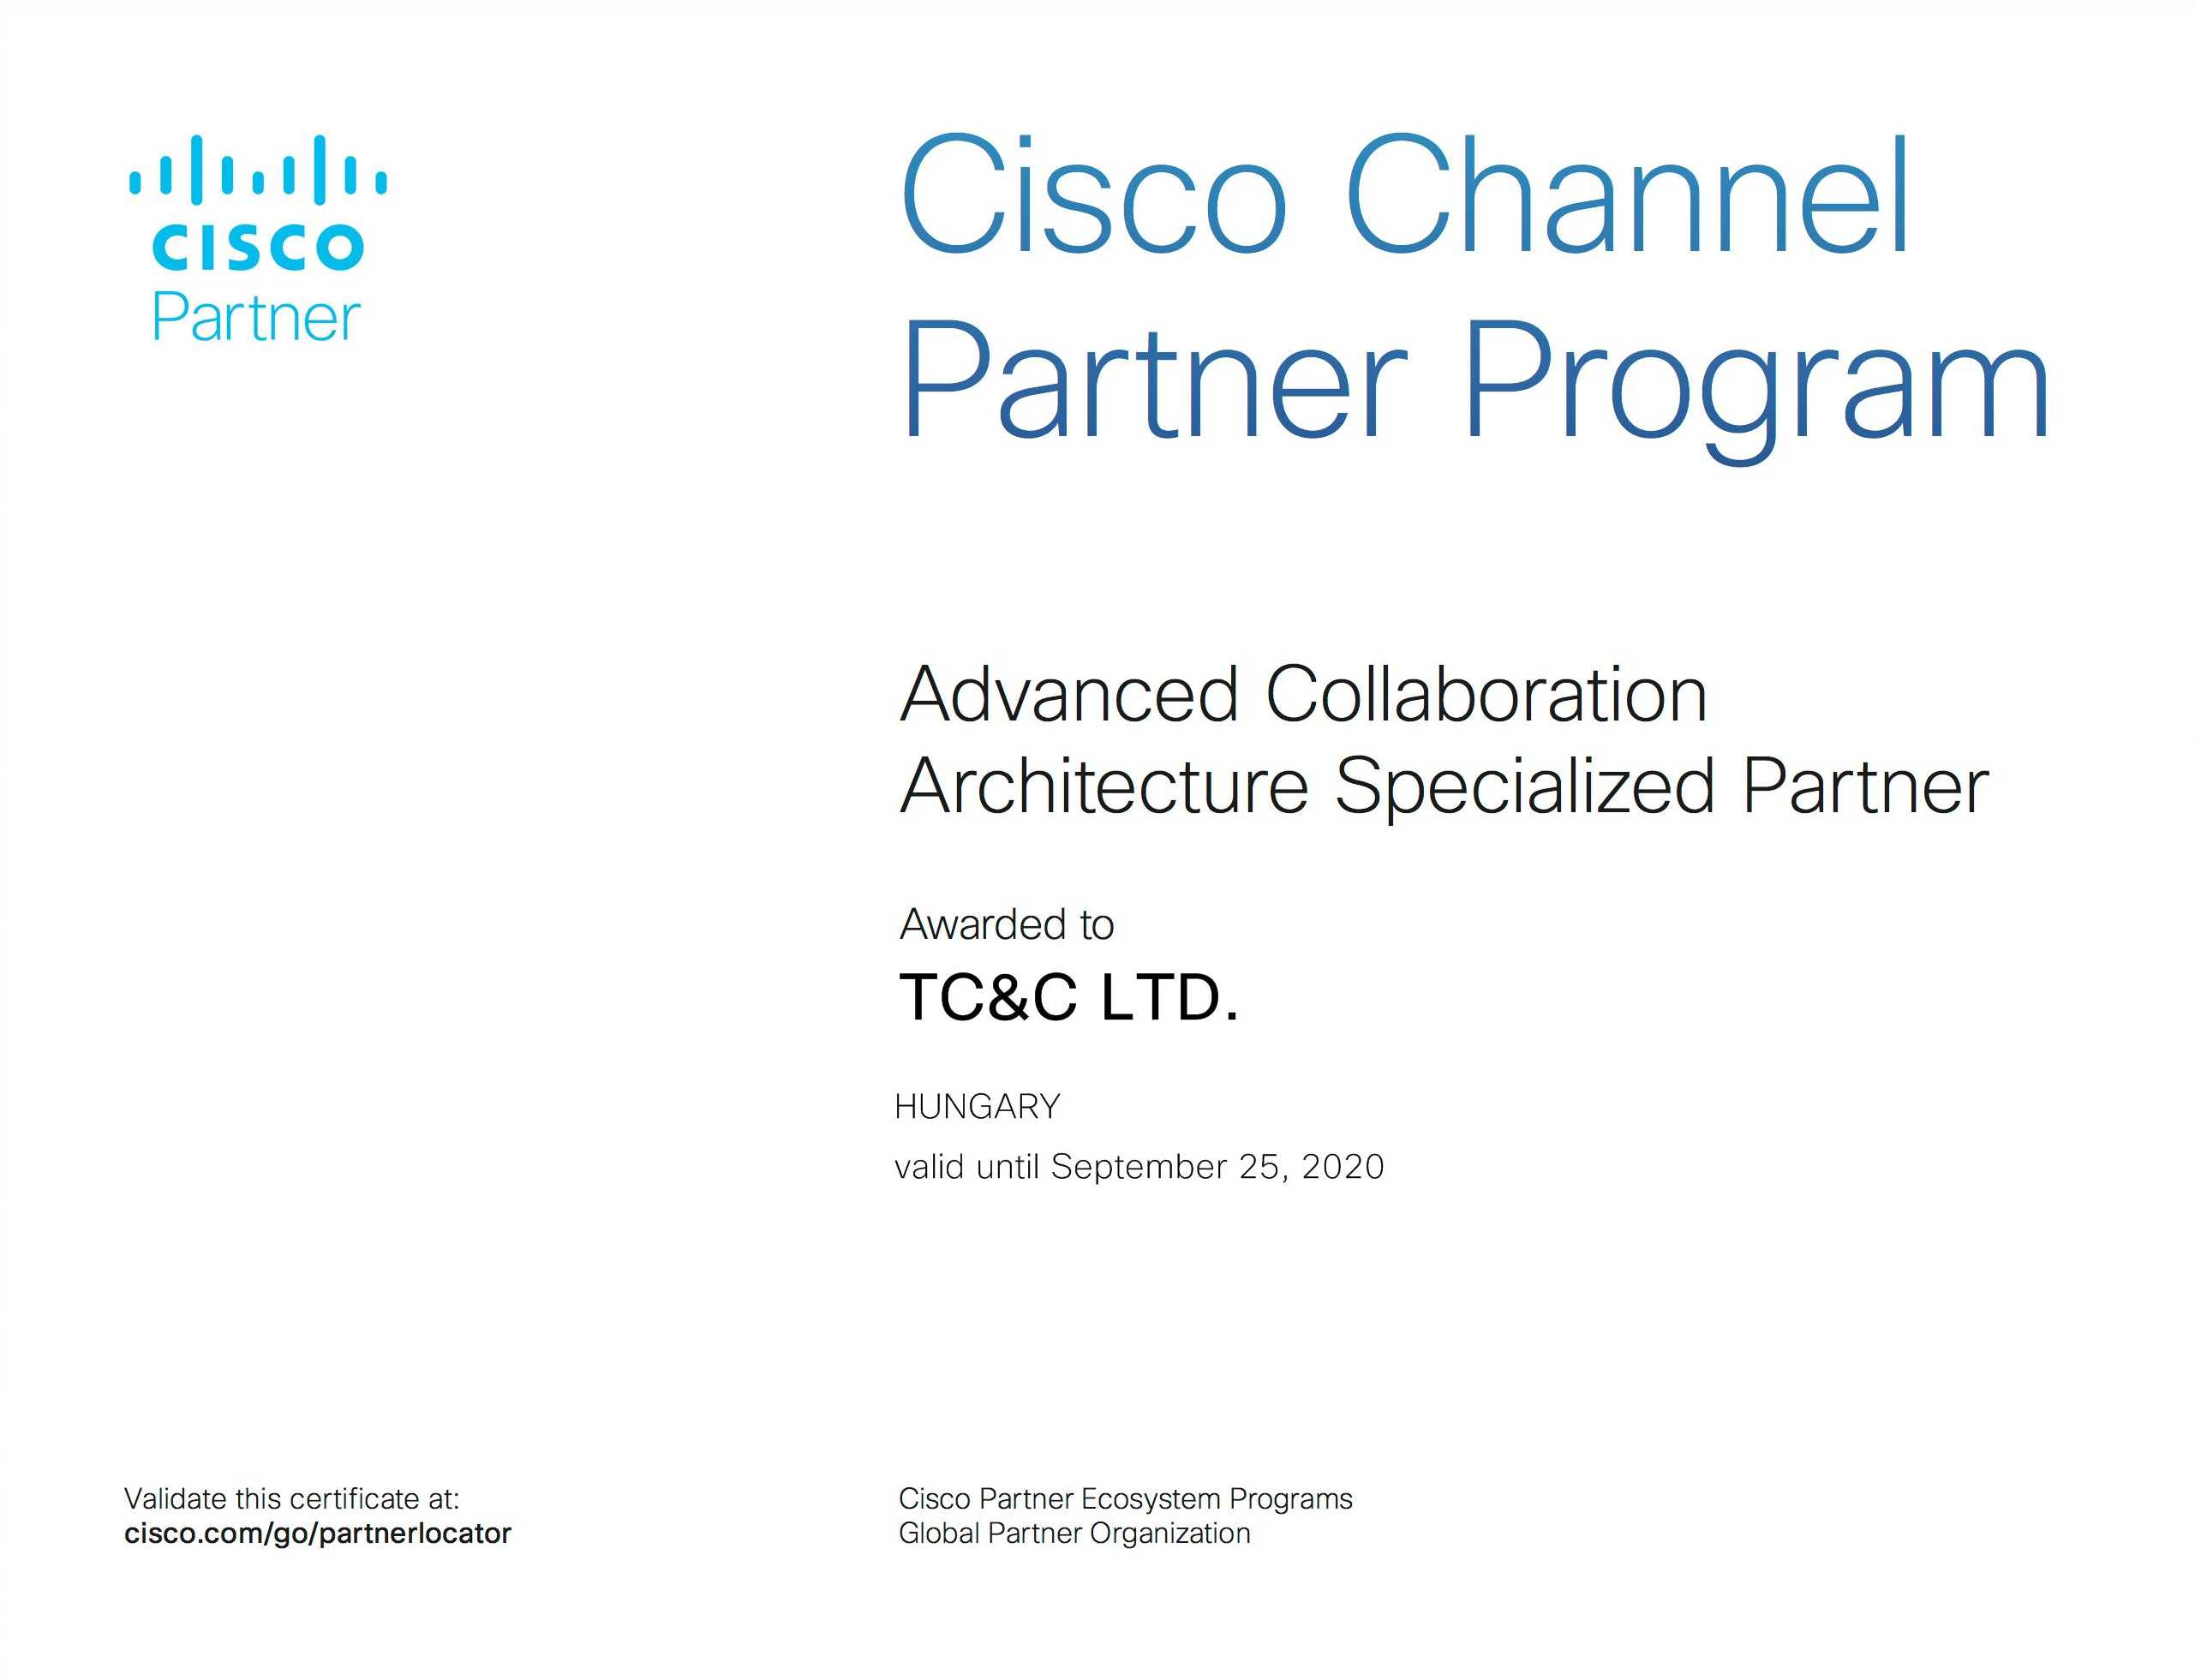 TC&C Achieves Advanced Collaboration Architecture